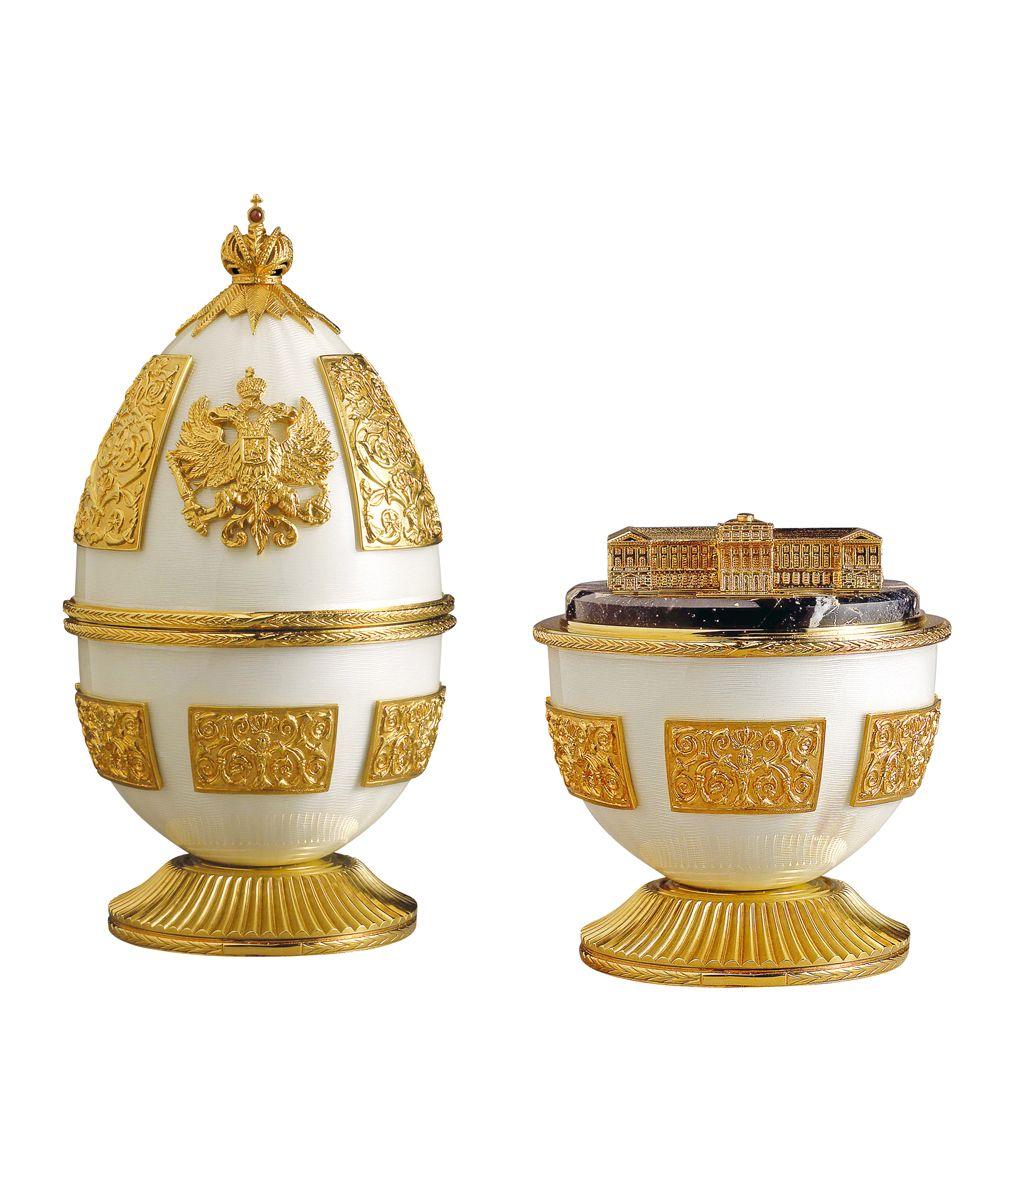 Mariinsky Egg Faberge Eggs Faberge Luxury Baby